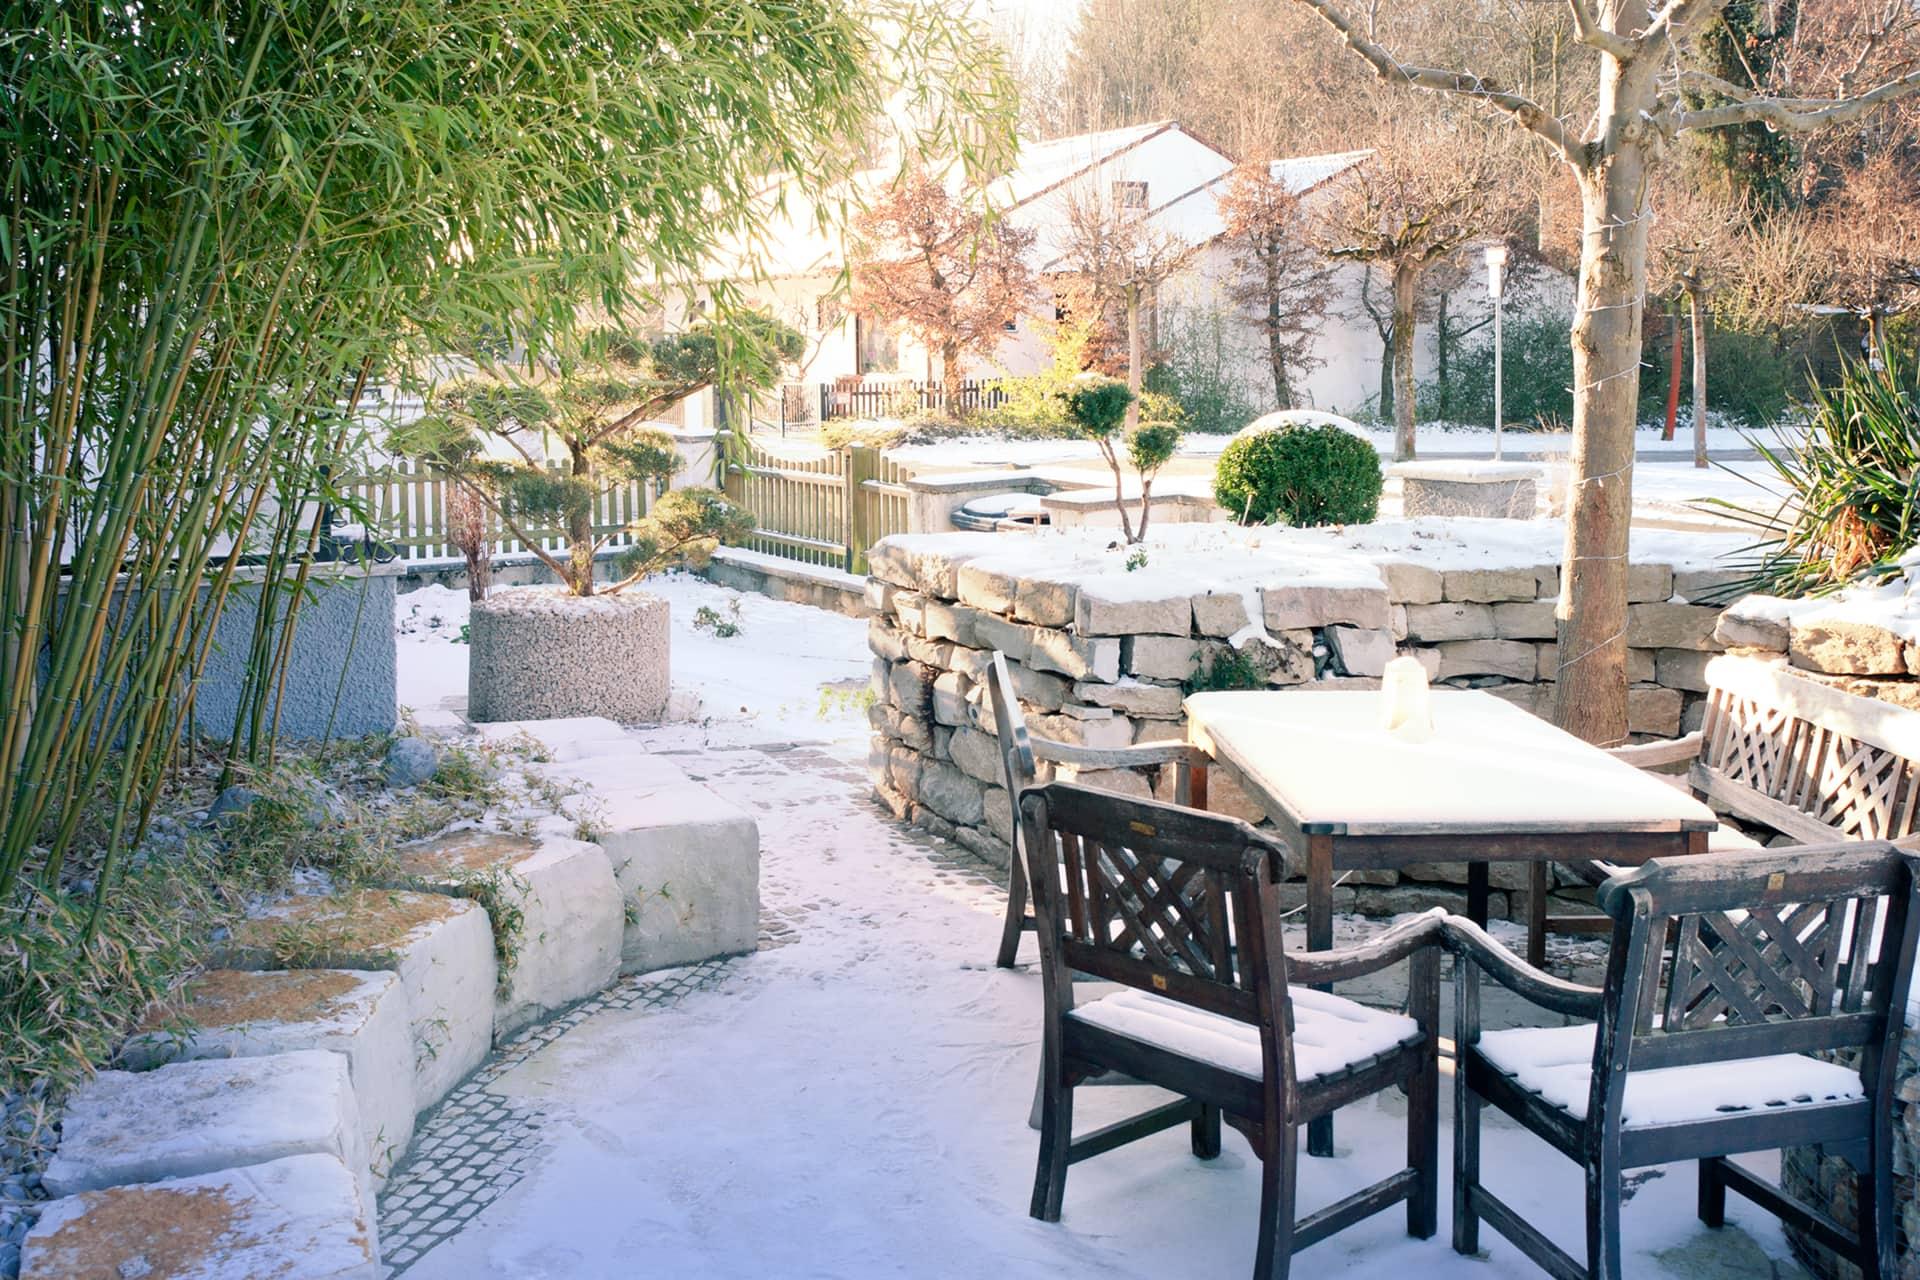 Garden in Winter with Snow